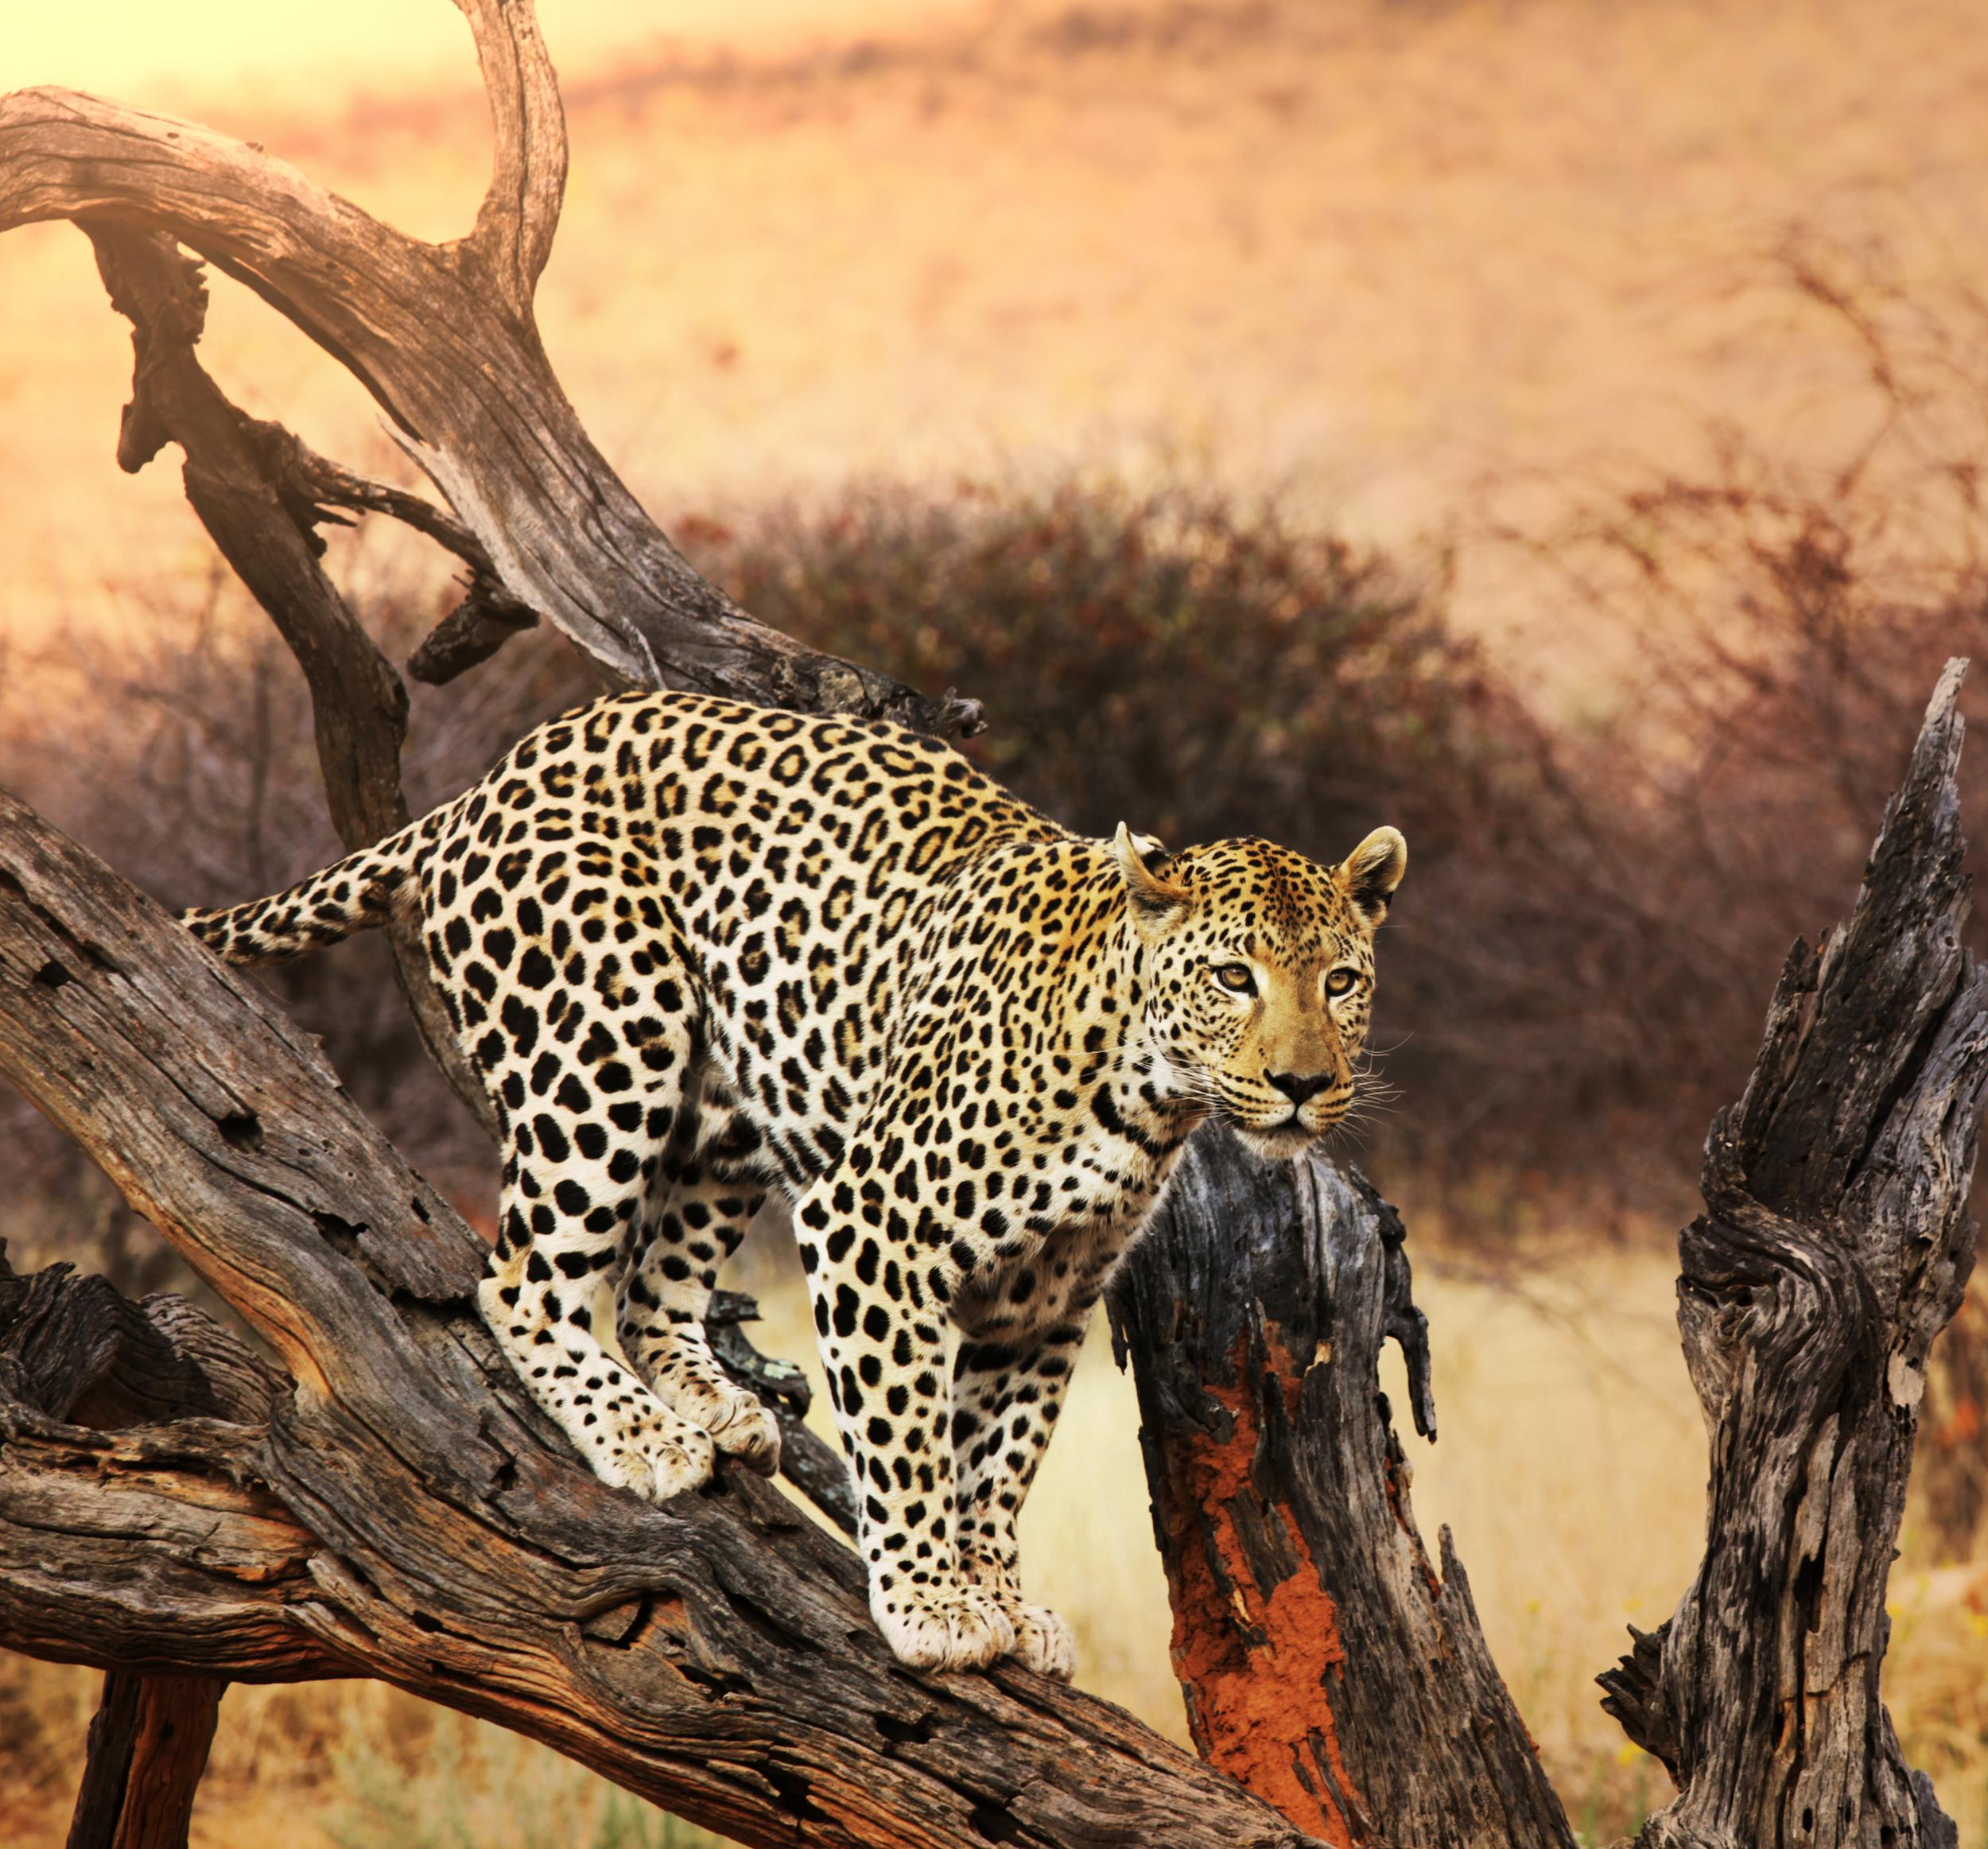 invite-to-paradise-sri-lanka-honeymoon-holiday-wildlife-leopard-safari-1.jpg